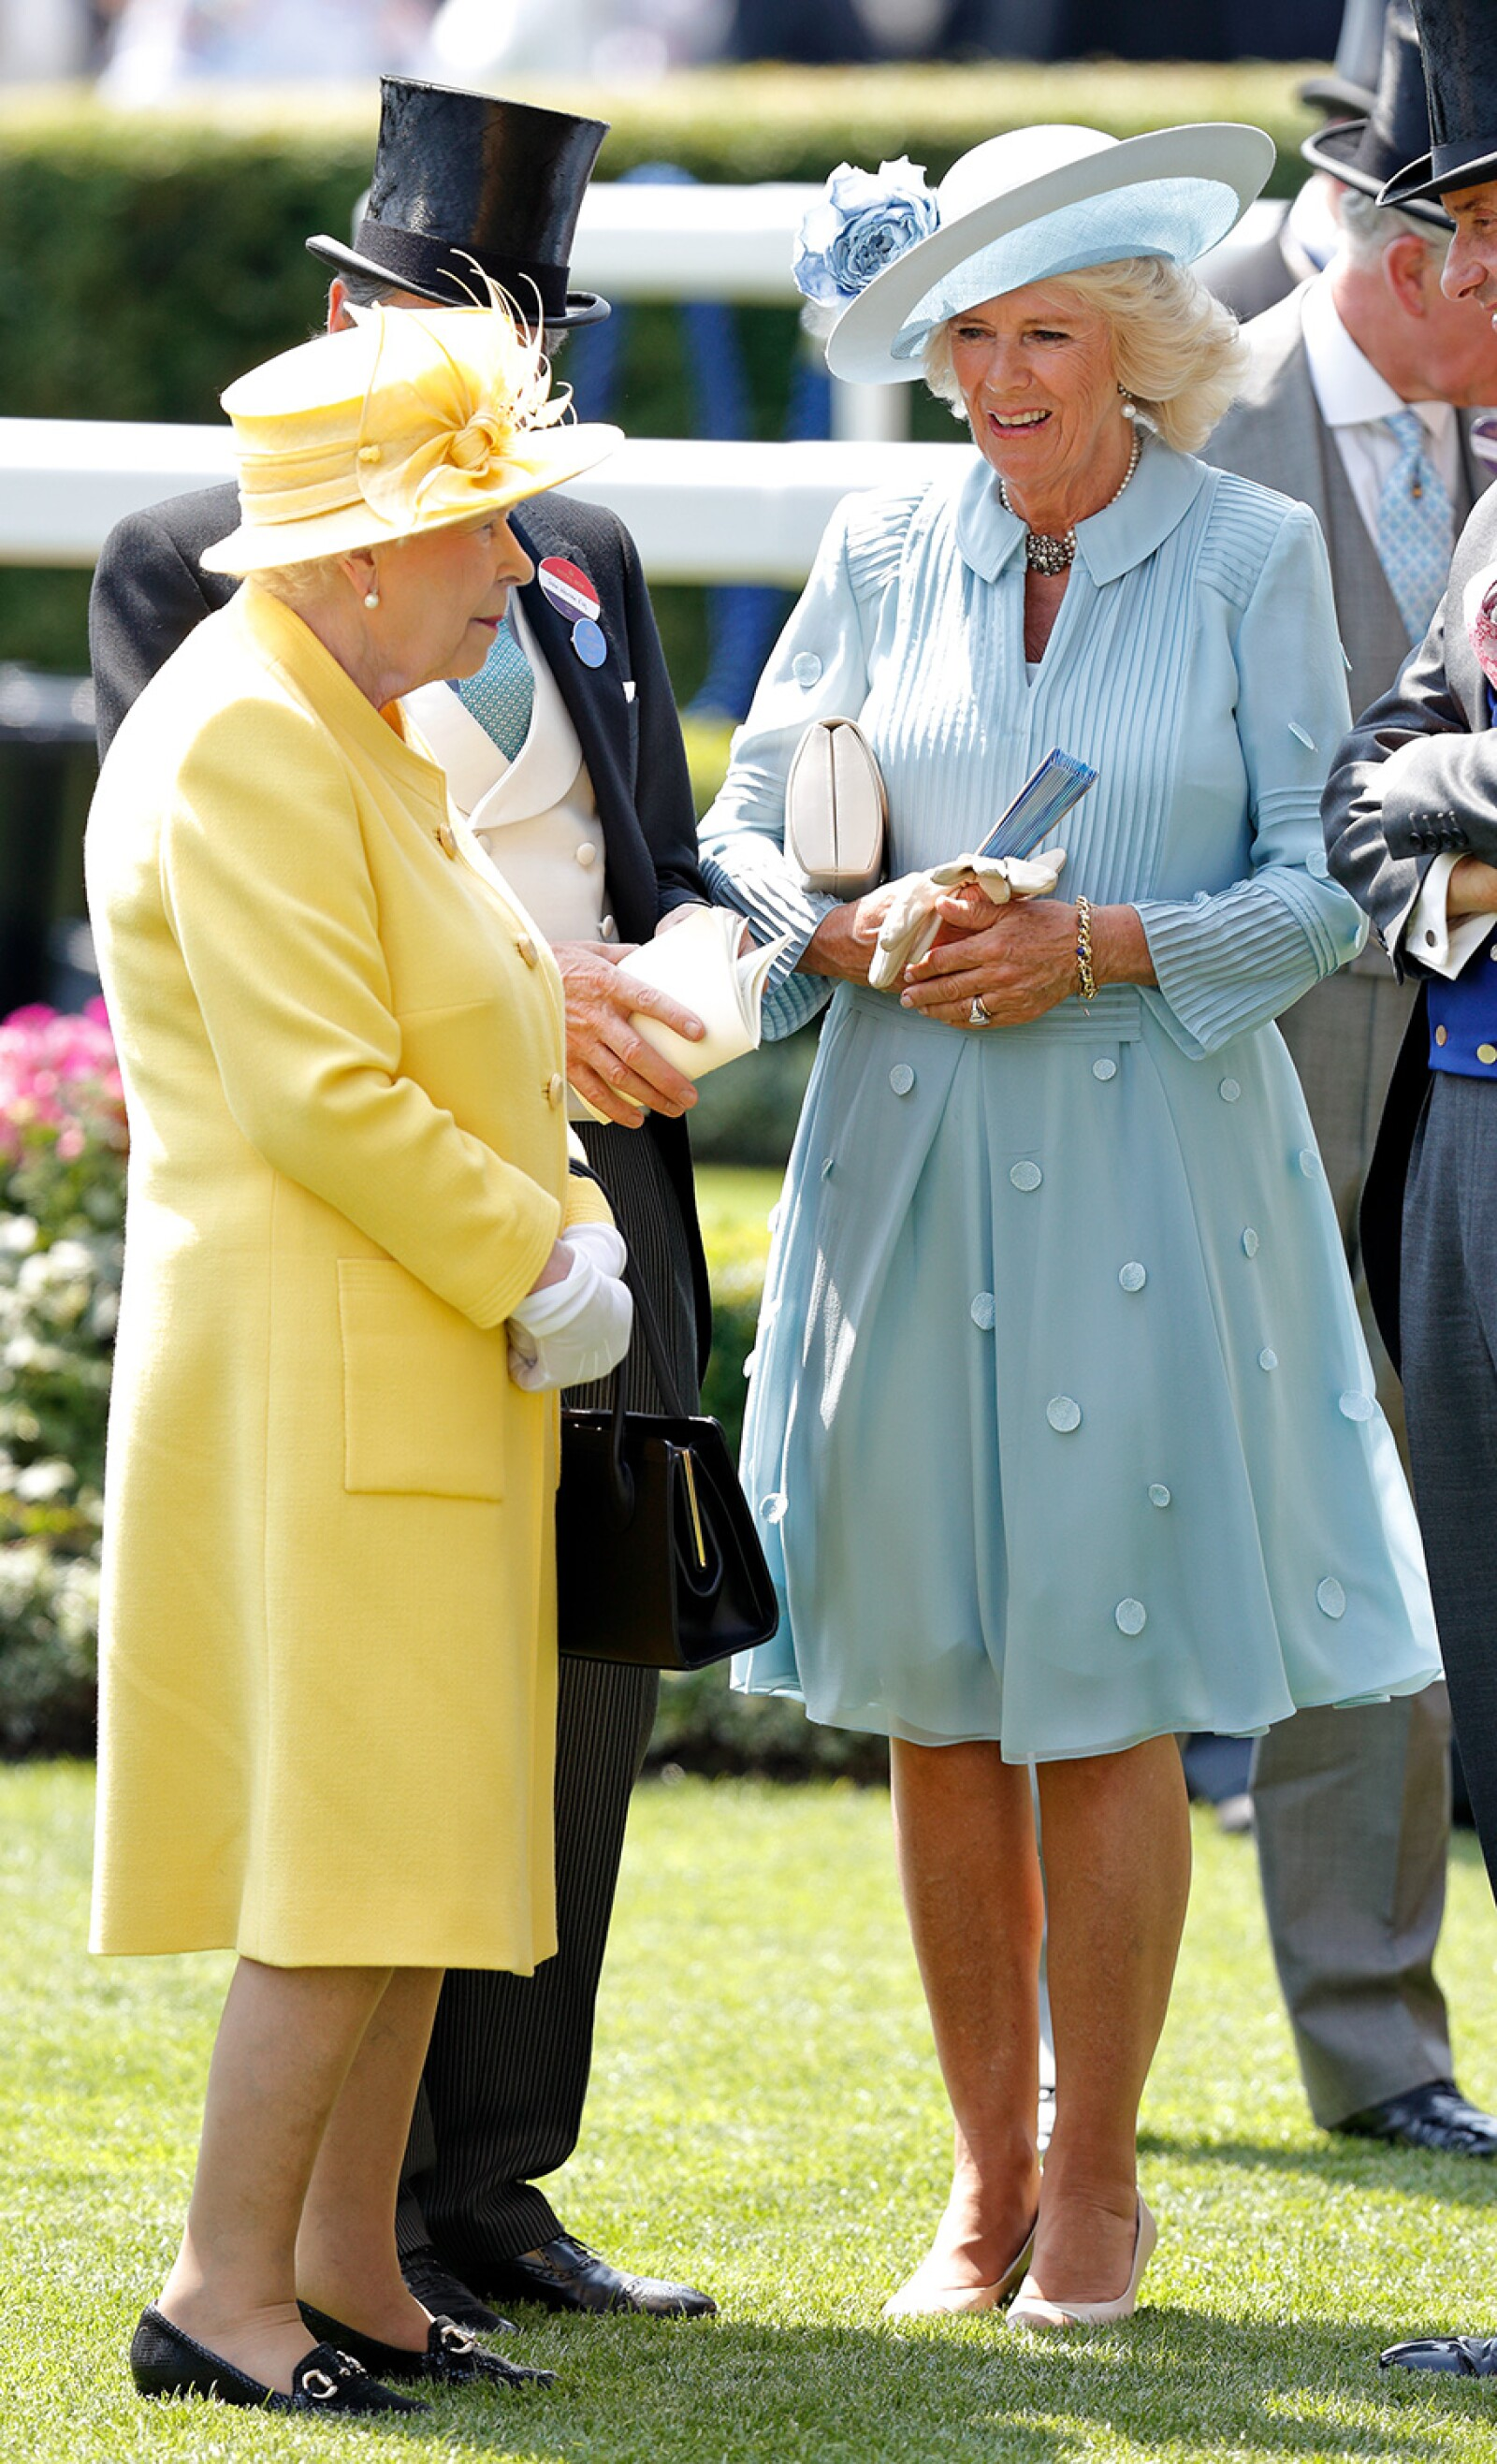 Reina Isabel II y Camilla, Duquesa de Cornwall